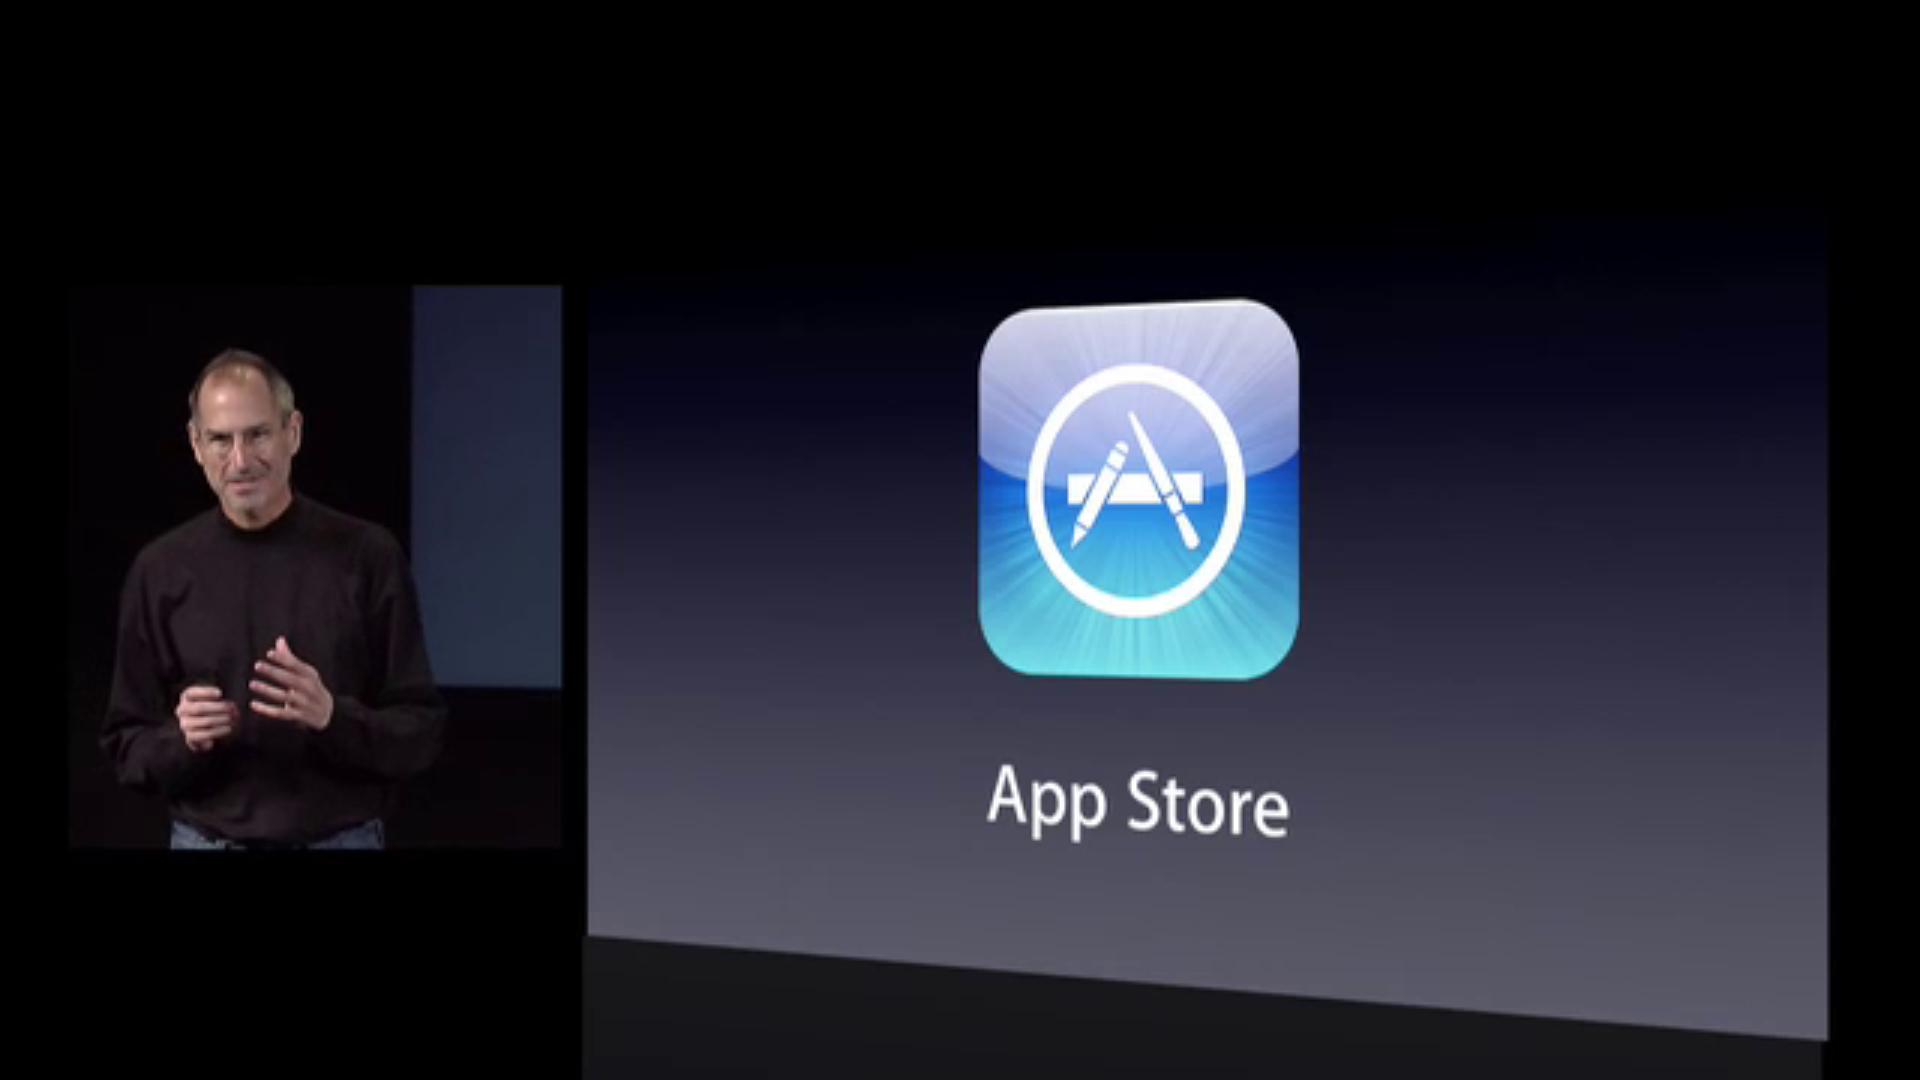 Steve Jobs apresentando a App Store